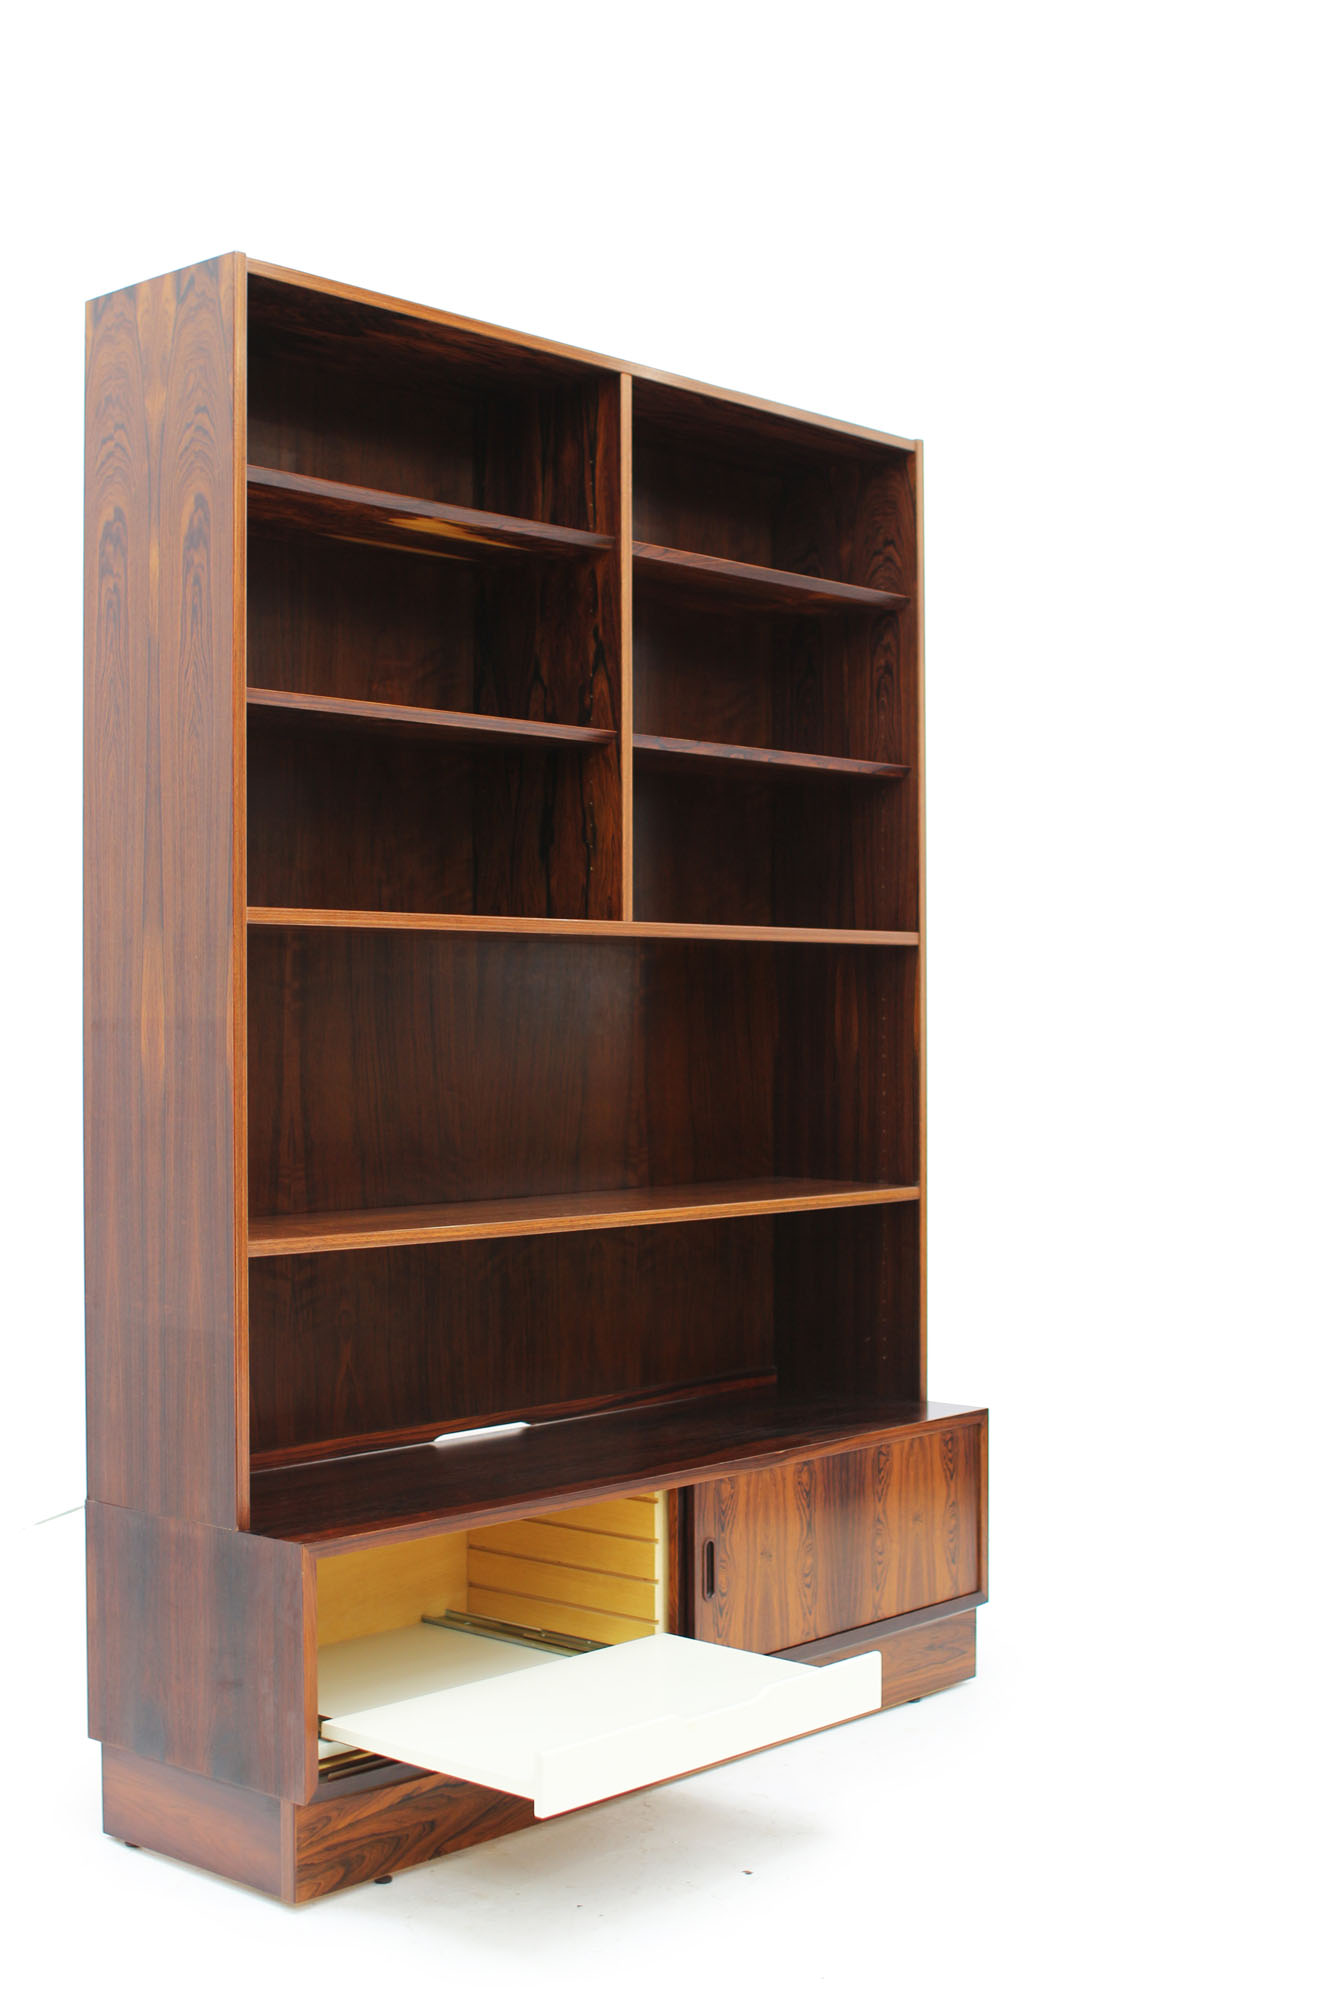 Poul Hundevad Rosewood Bookcase Made in Denmark (4).jpg